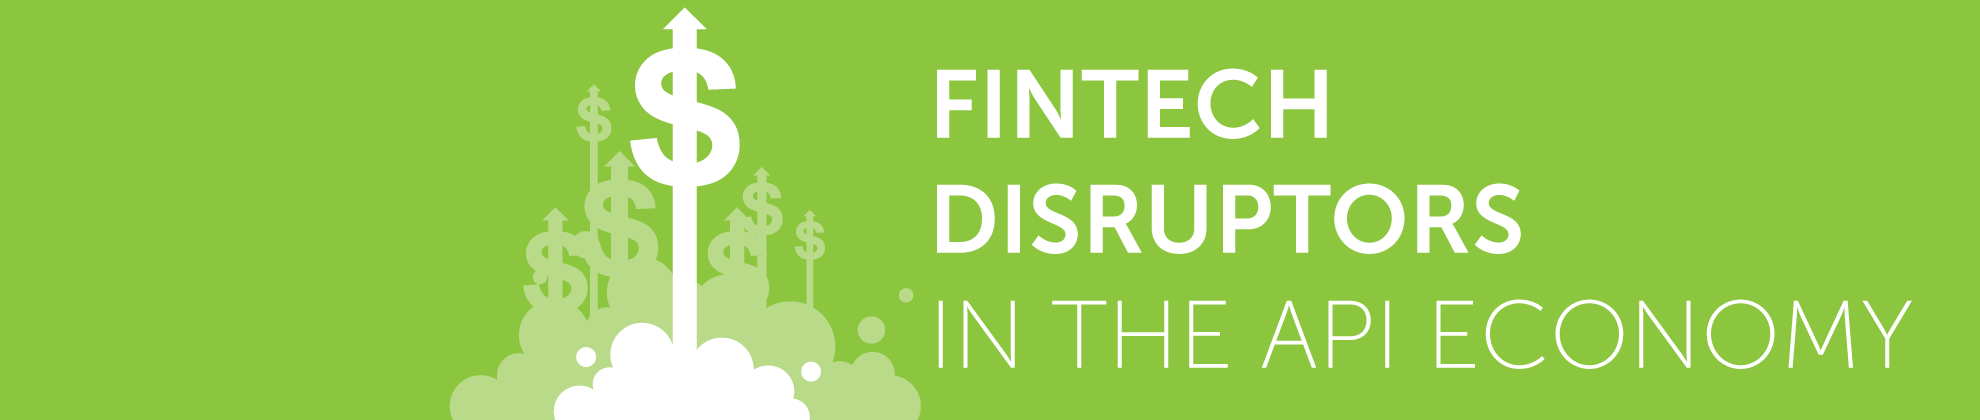 fintech-disruption-blog.png